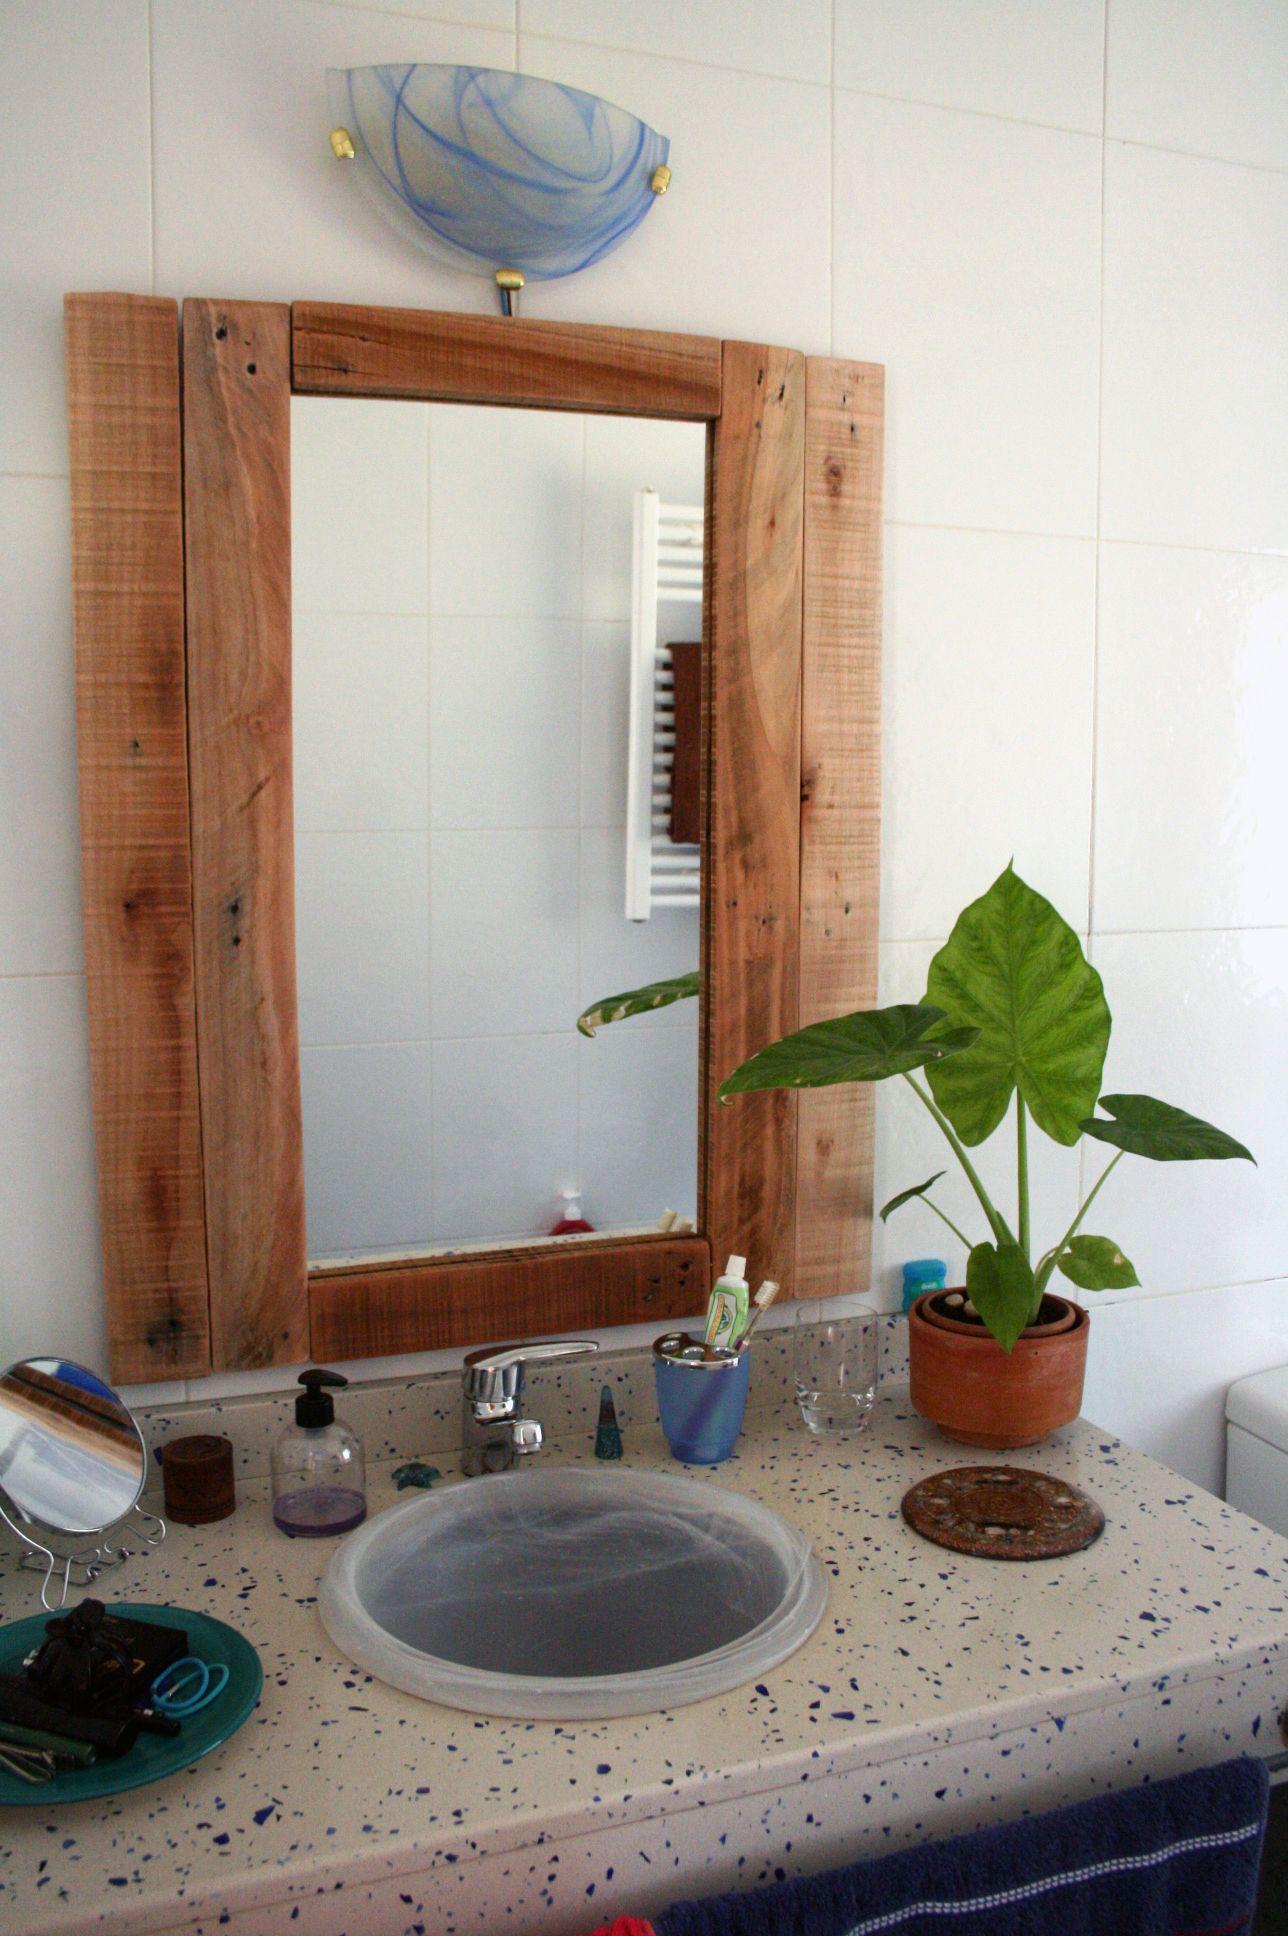 Mi 2 186 Mini Proyecto Un Marco Para El Espejo Del Ba 241 O